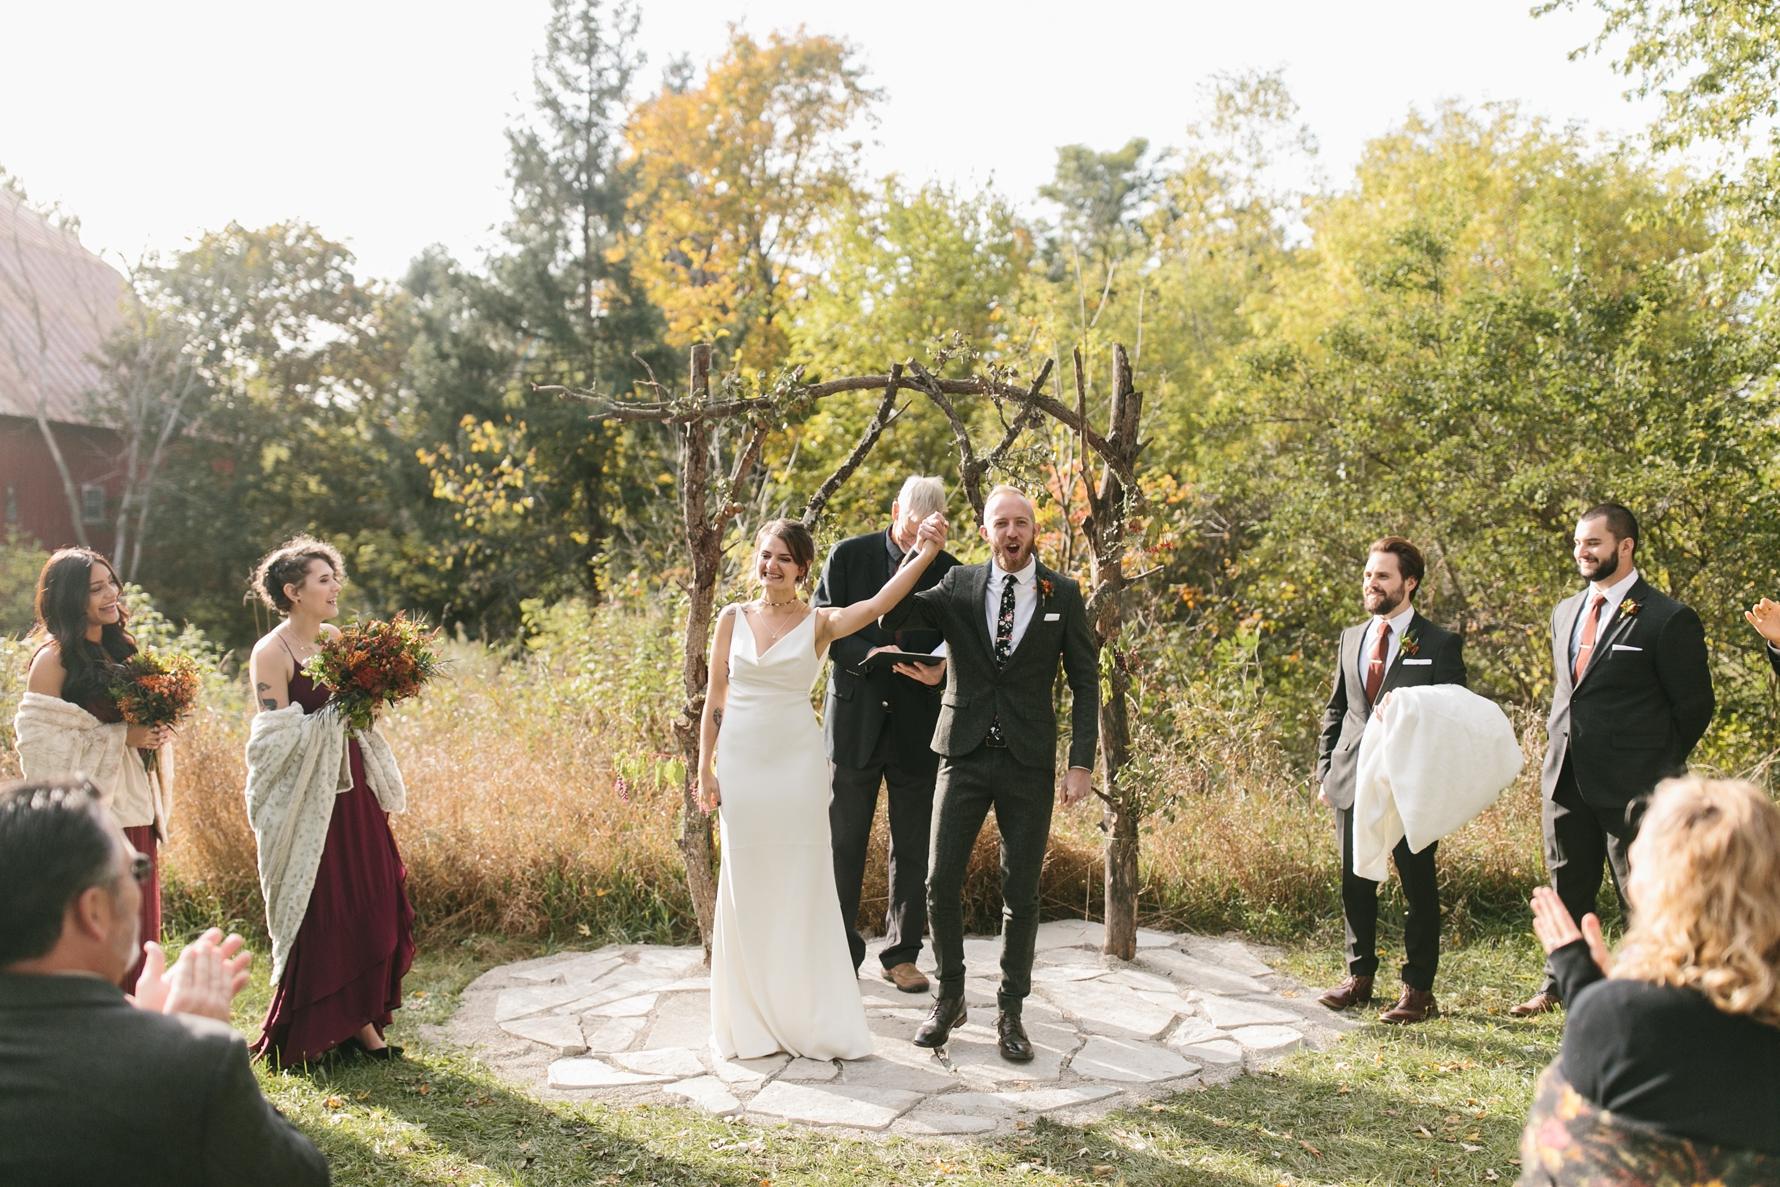 norris-traverse-city-wedding-48.JPG